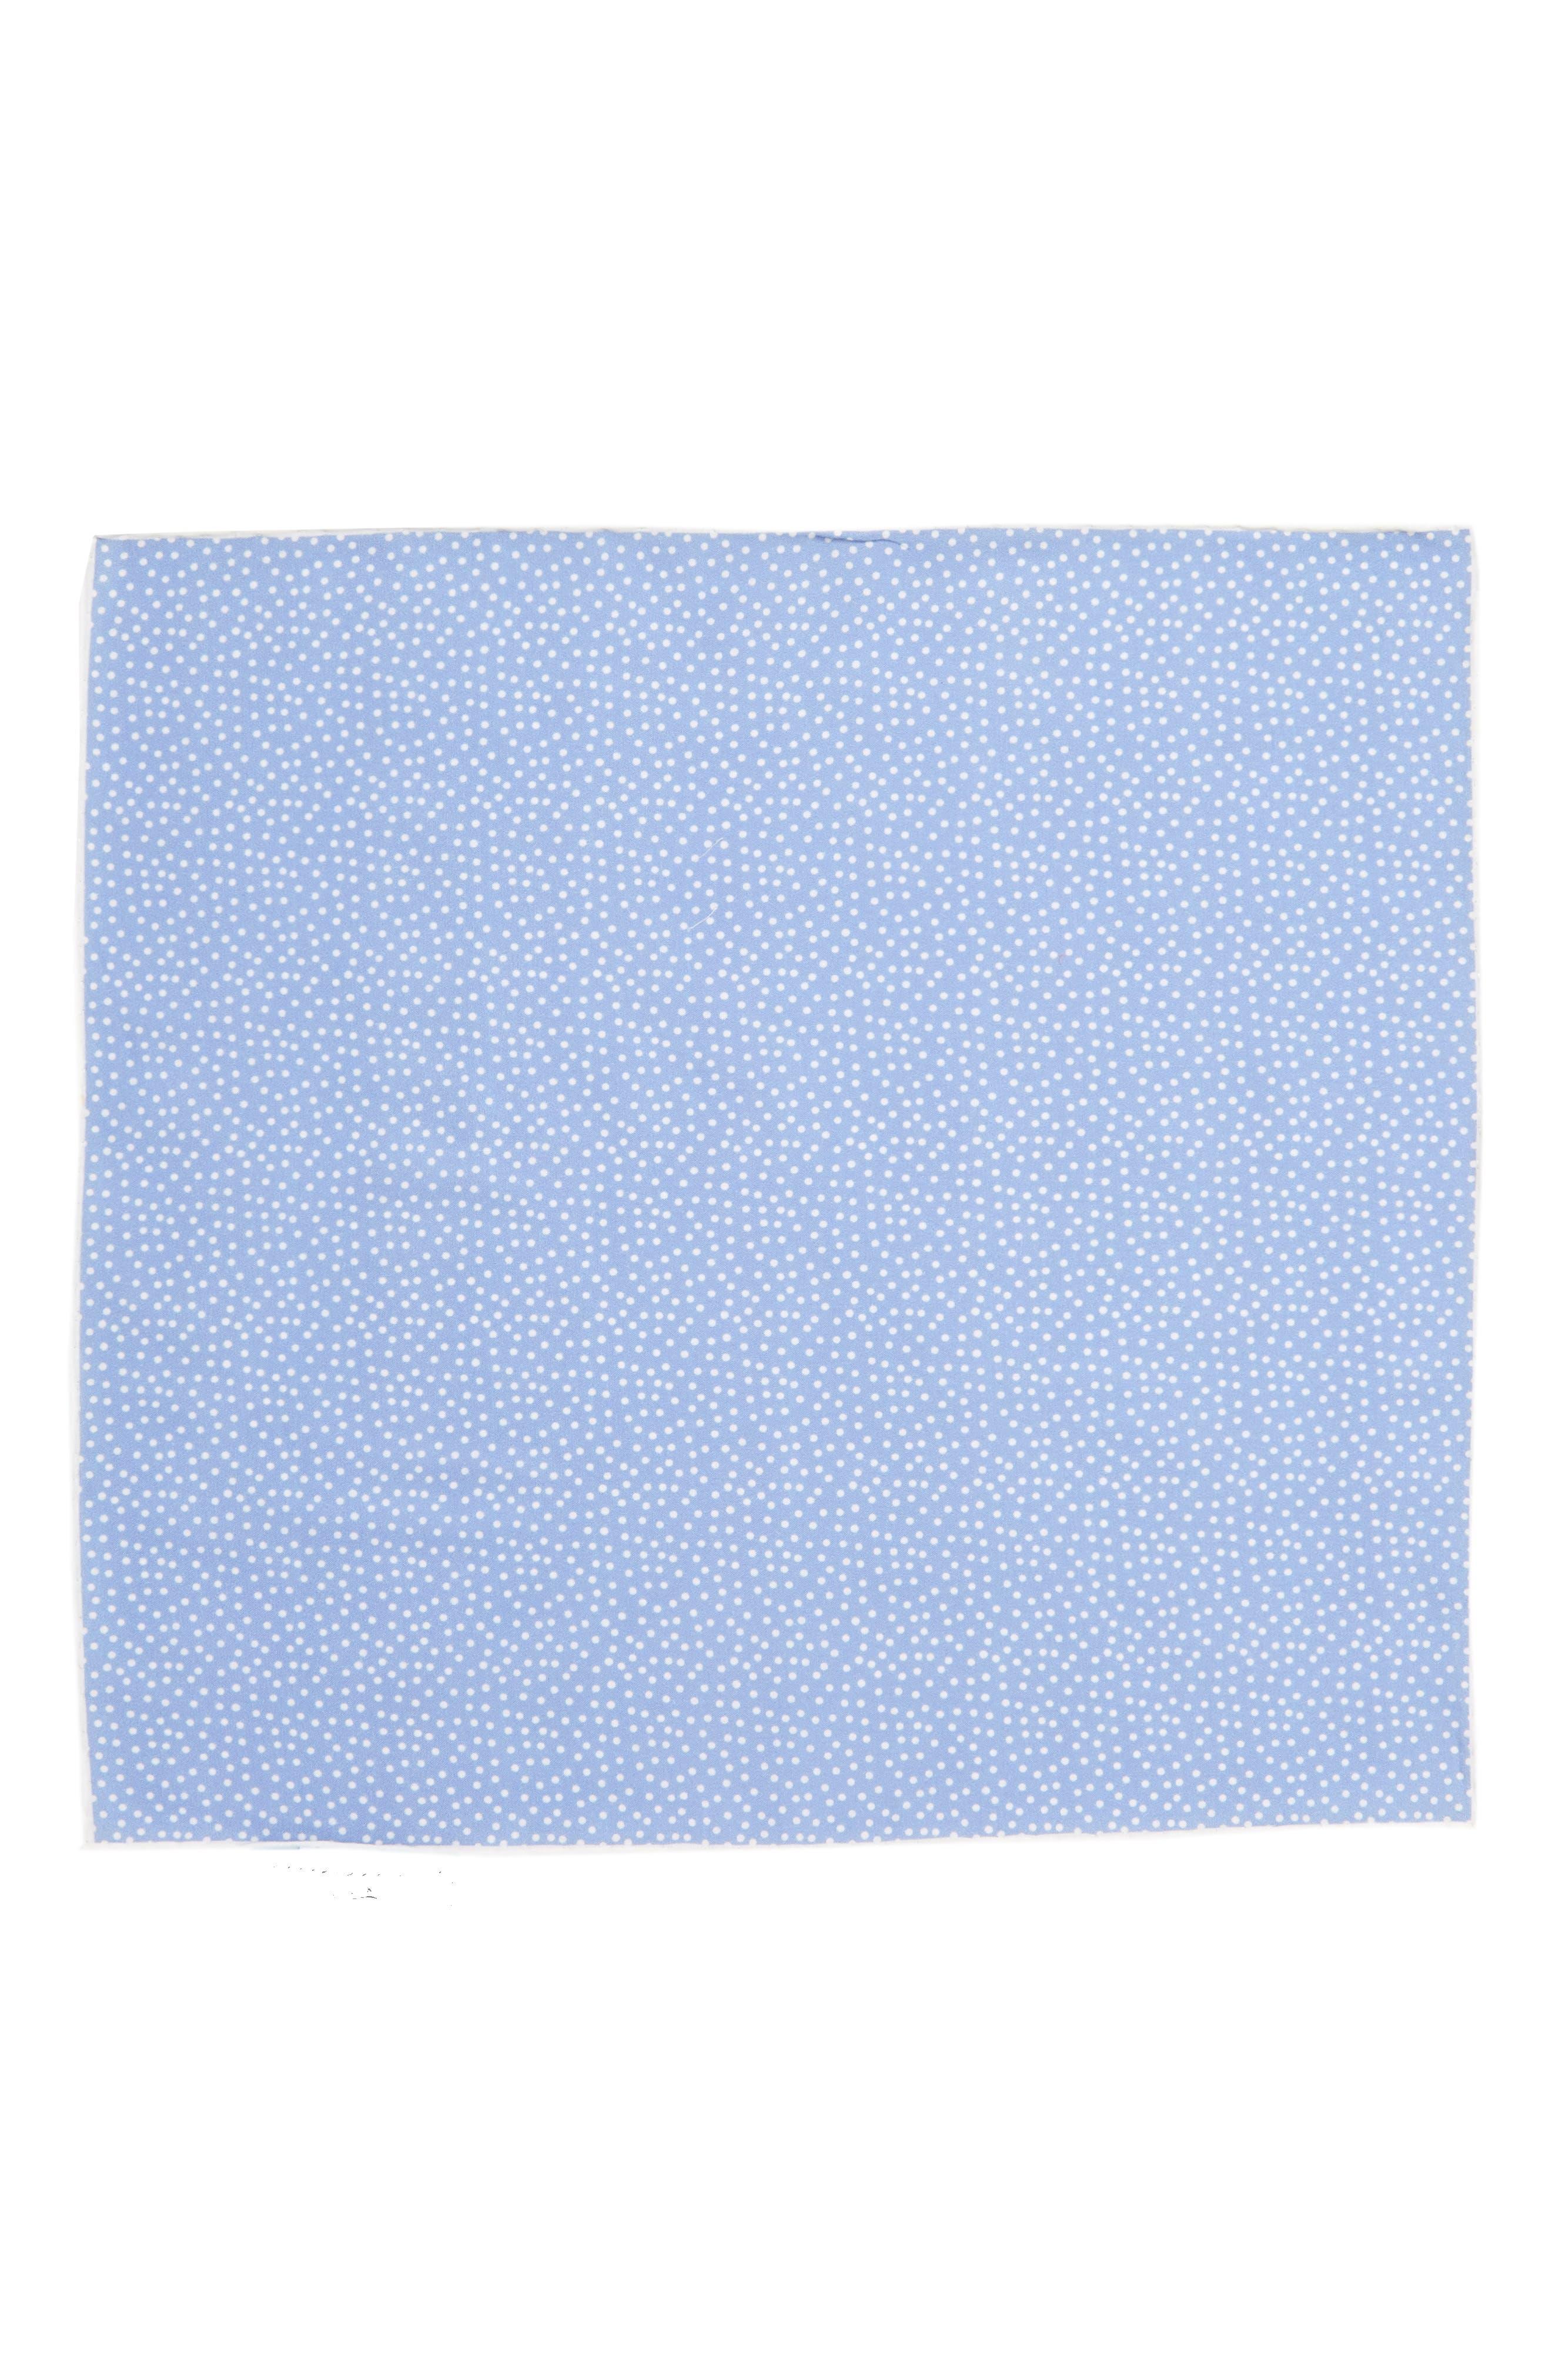 Sagamore Spots Cotton & Silk Pocket Square,                             Alternate thumbnail 2, color,                             Blue